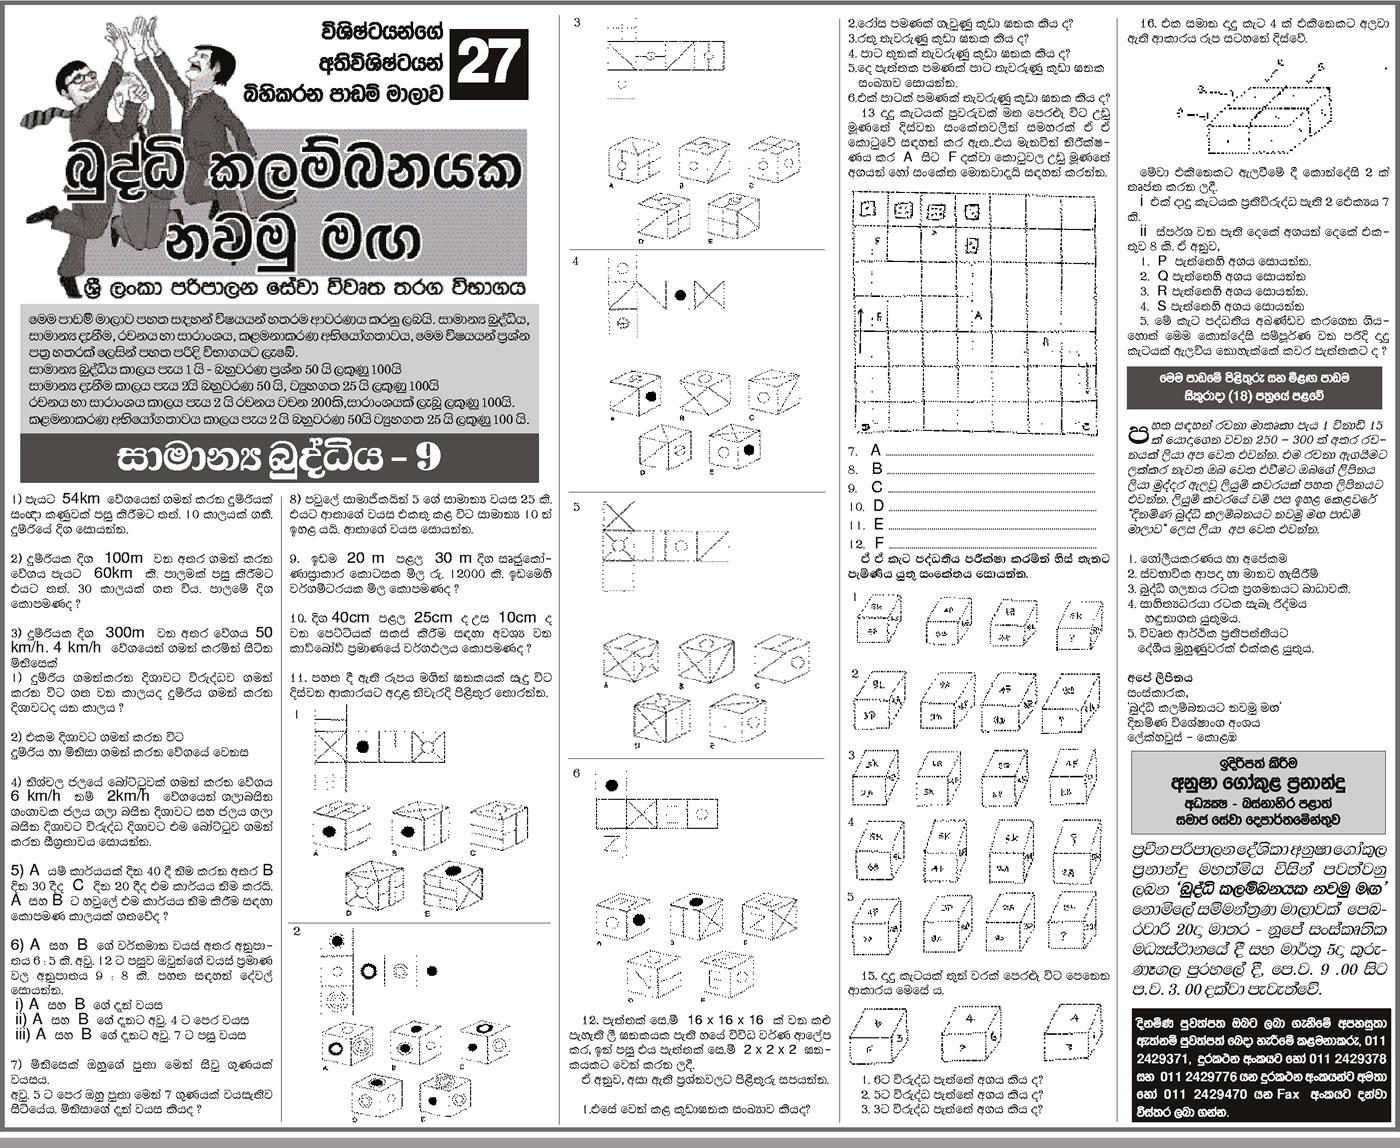 SLAS Past papers Sri Lanka Higher Education t Past